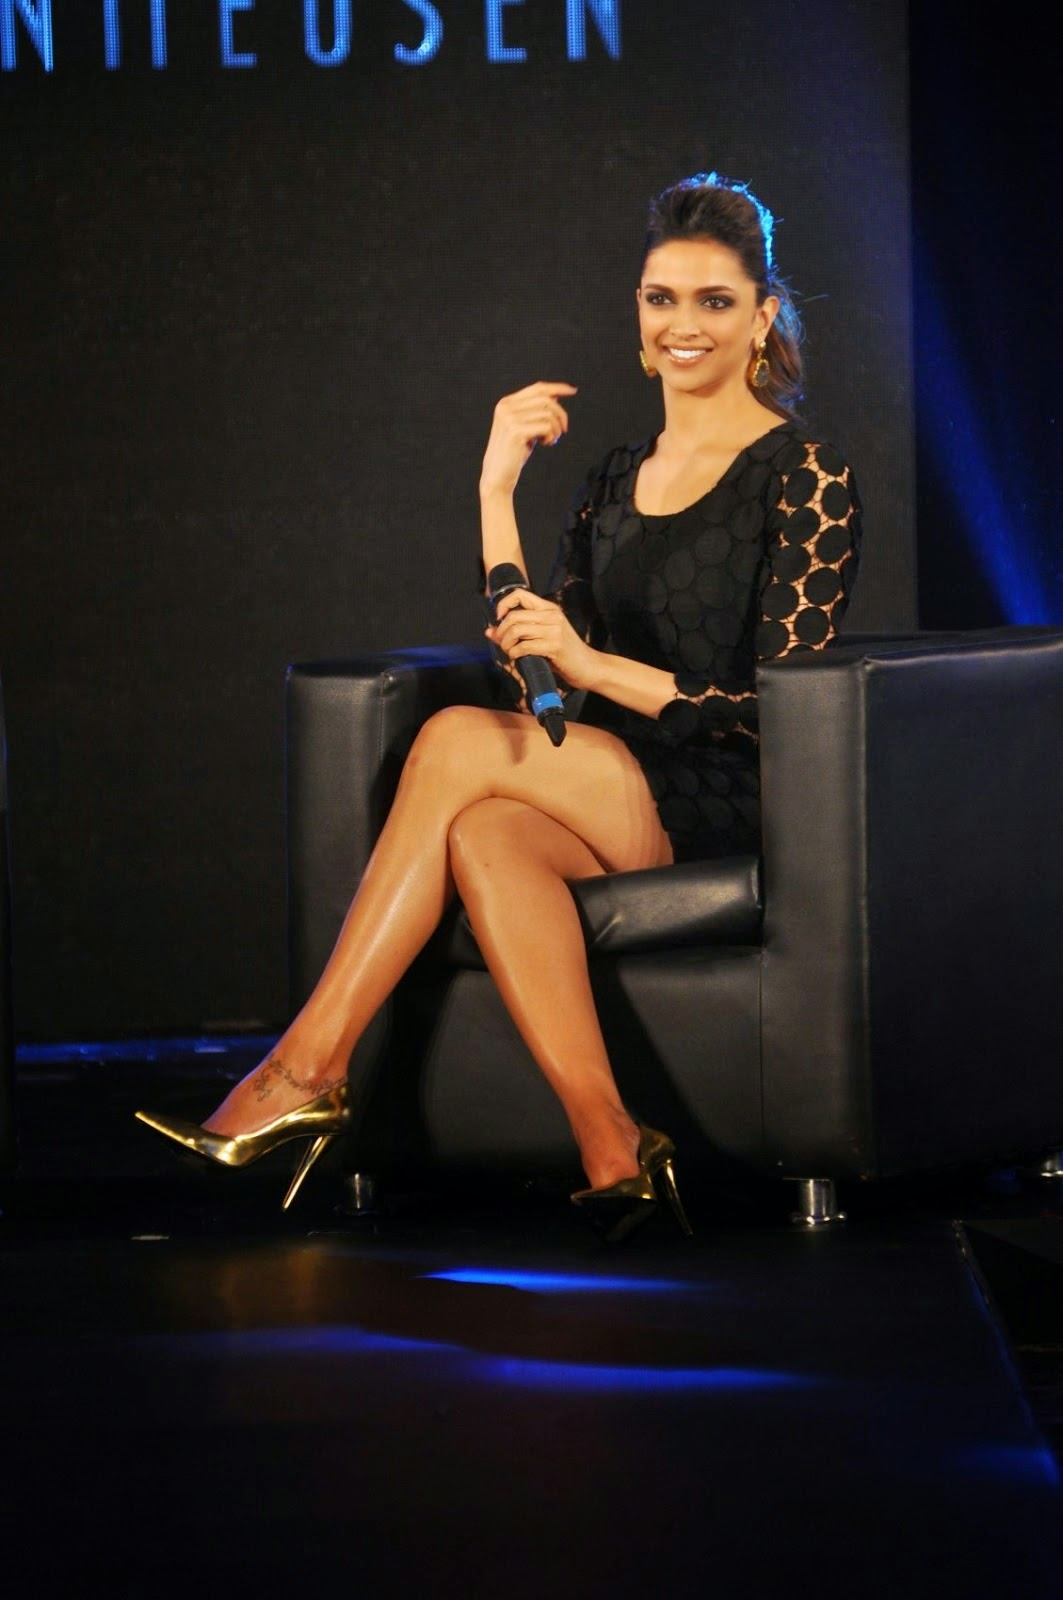 Deepika Padukone Showing Her Hot and Sexy Legs